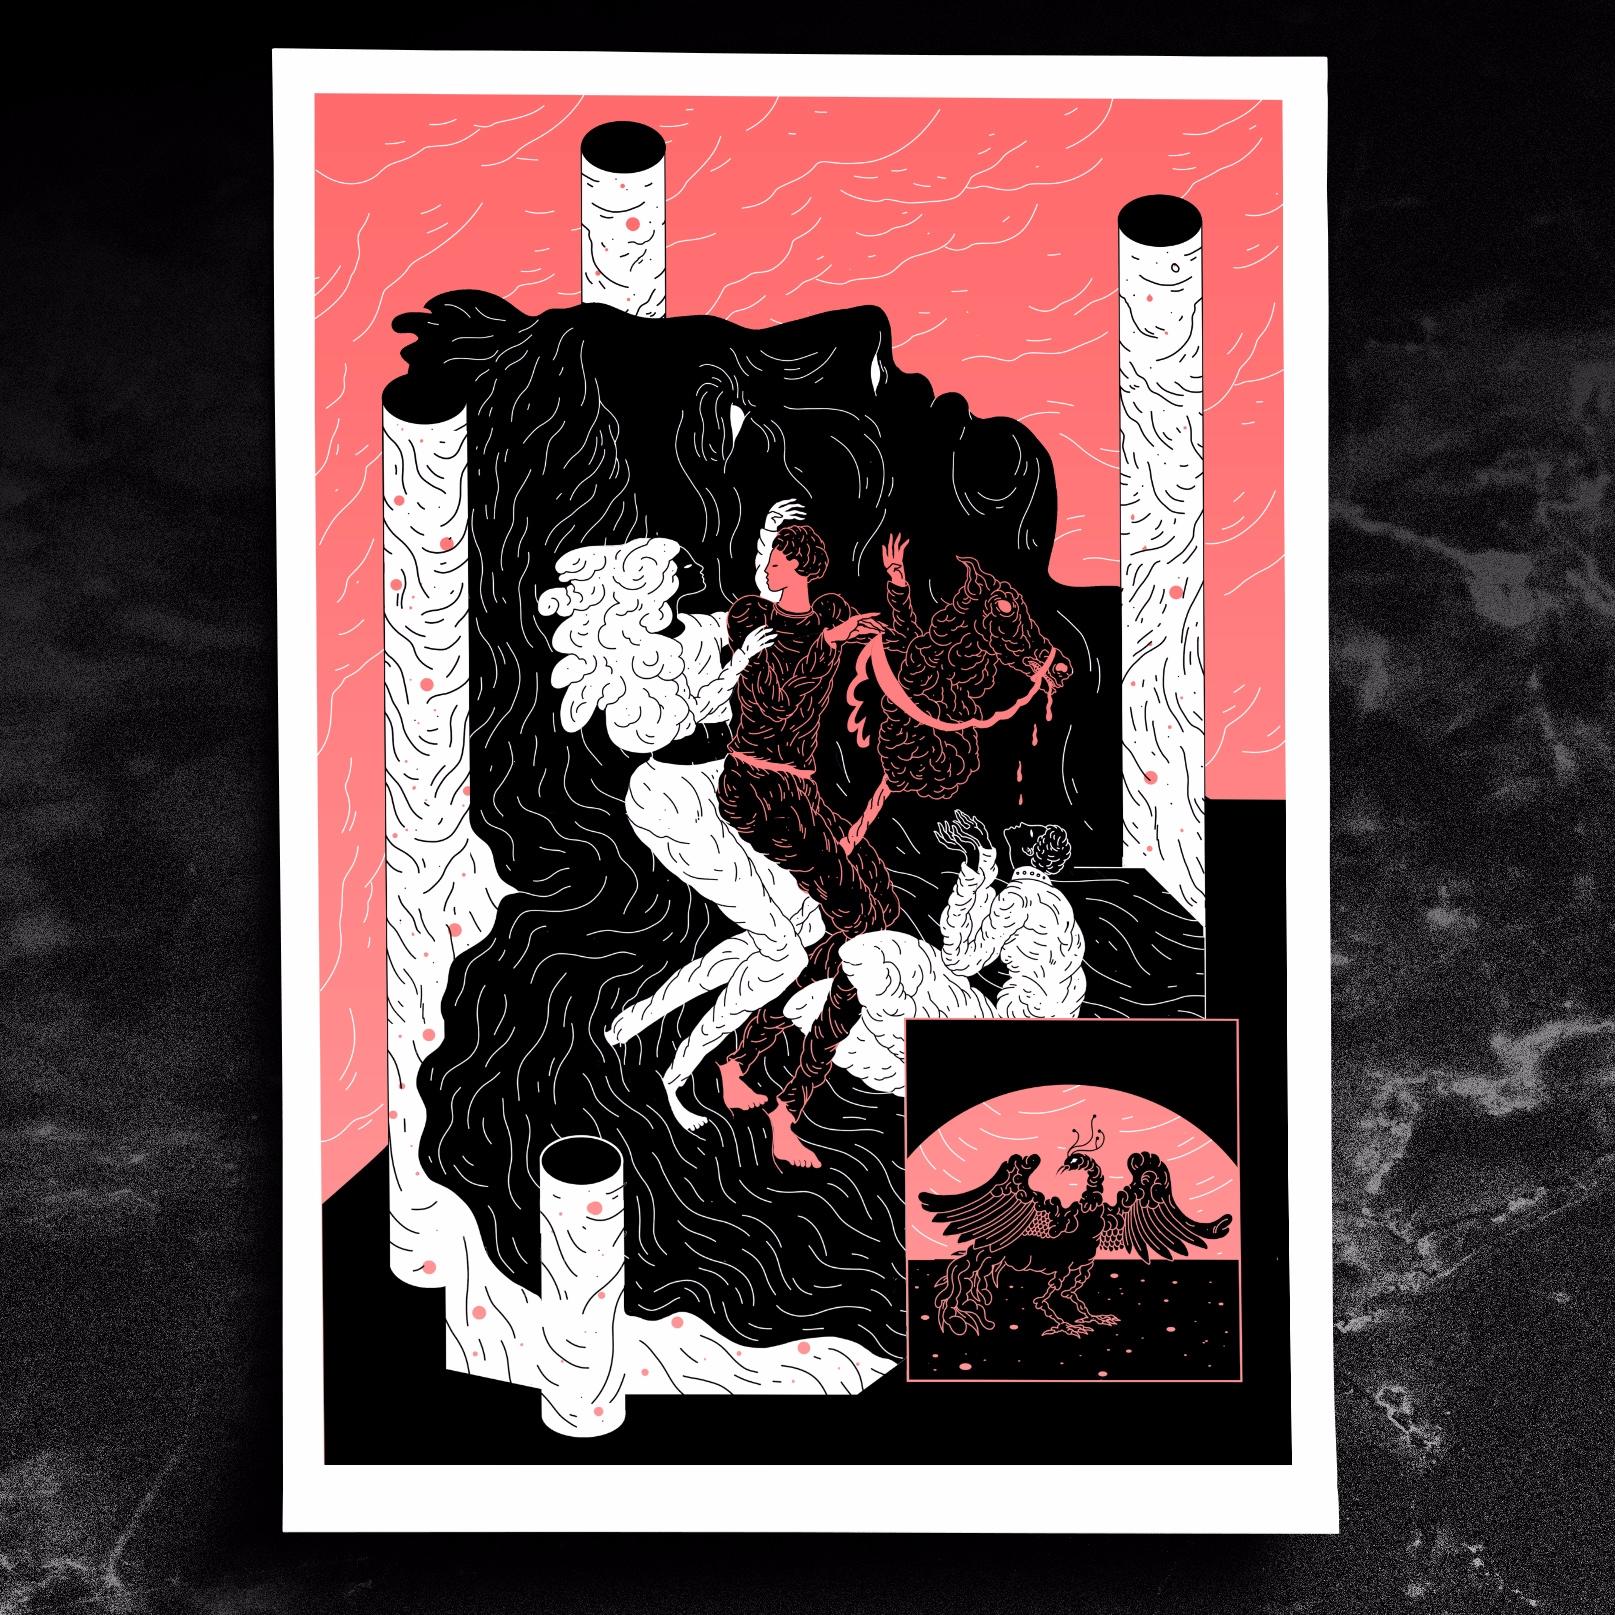 La Quête - illustration, art, print - julien_brogard | ello